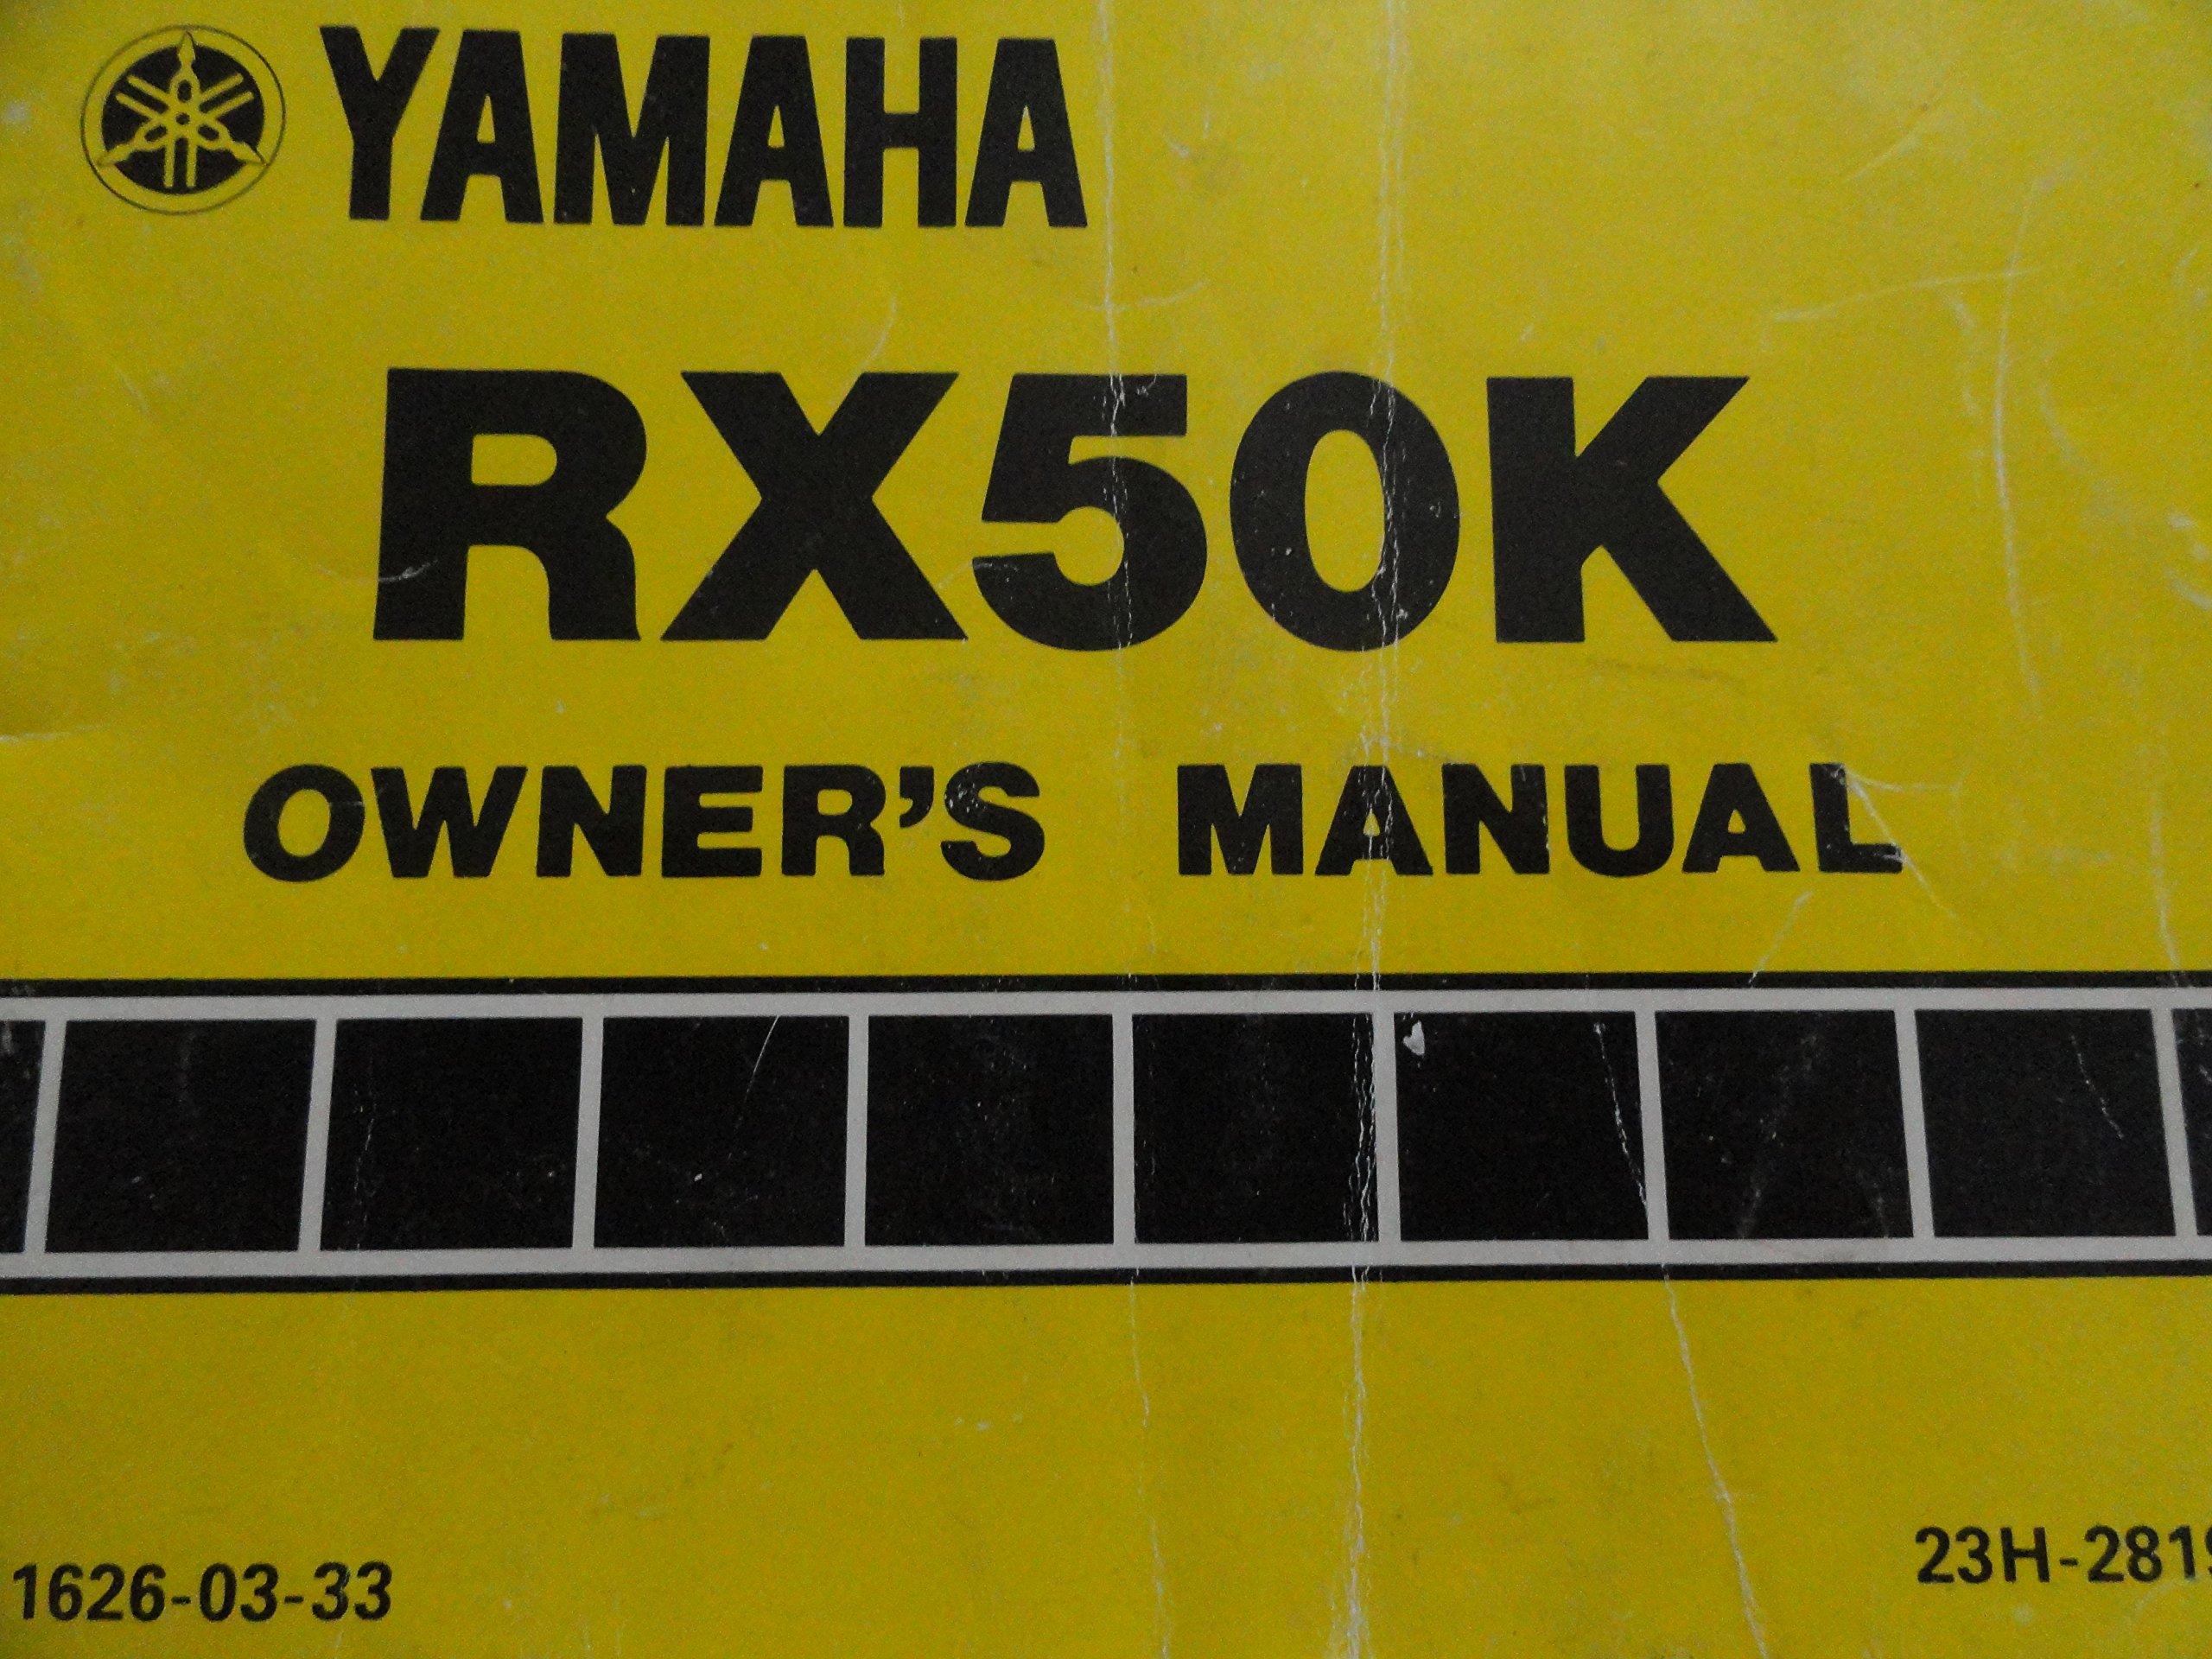 1982 1983 yamaha rx50k owners manual rx 50 k yamaha amazon com books rh amazon com Yamaha RX50 Craigslist Yamaha RX50 Craigslist